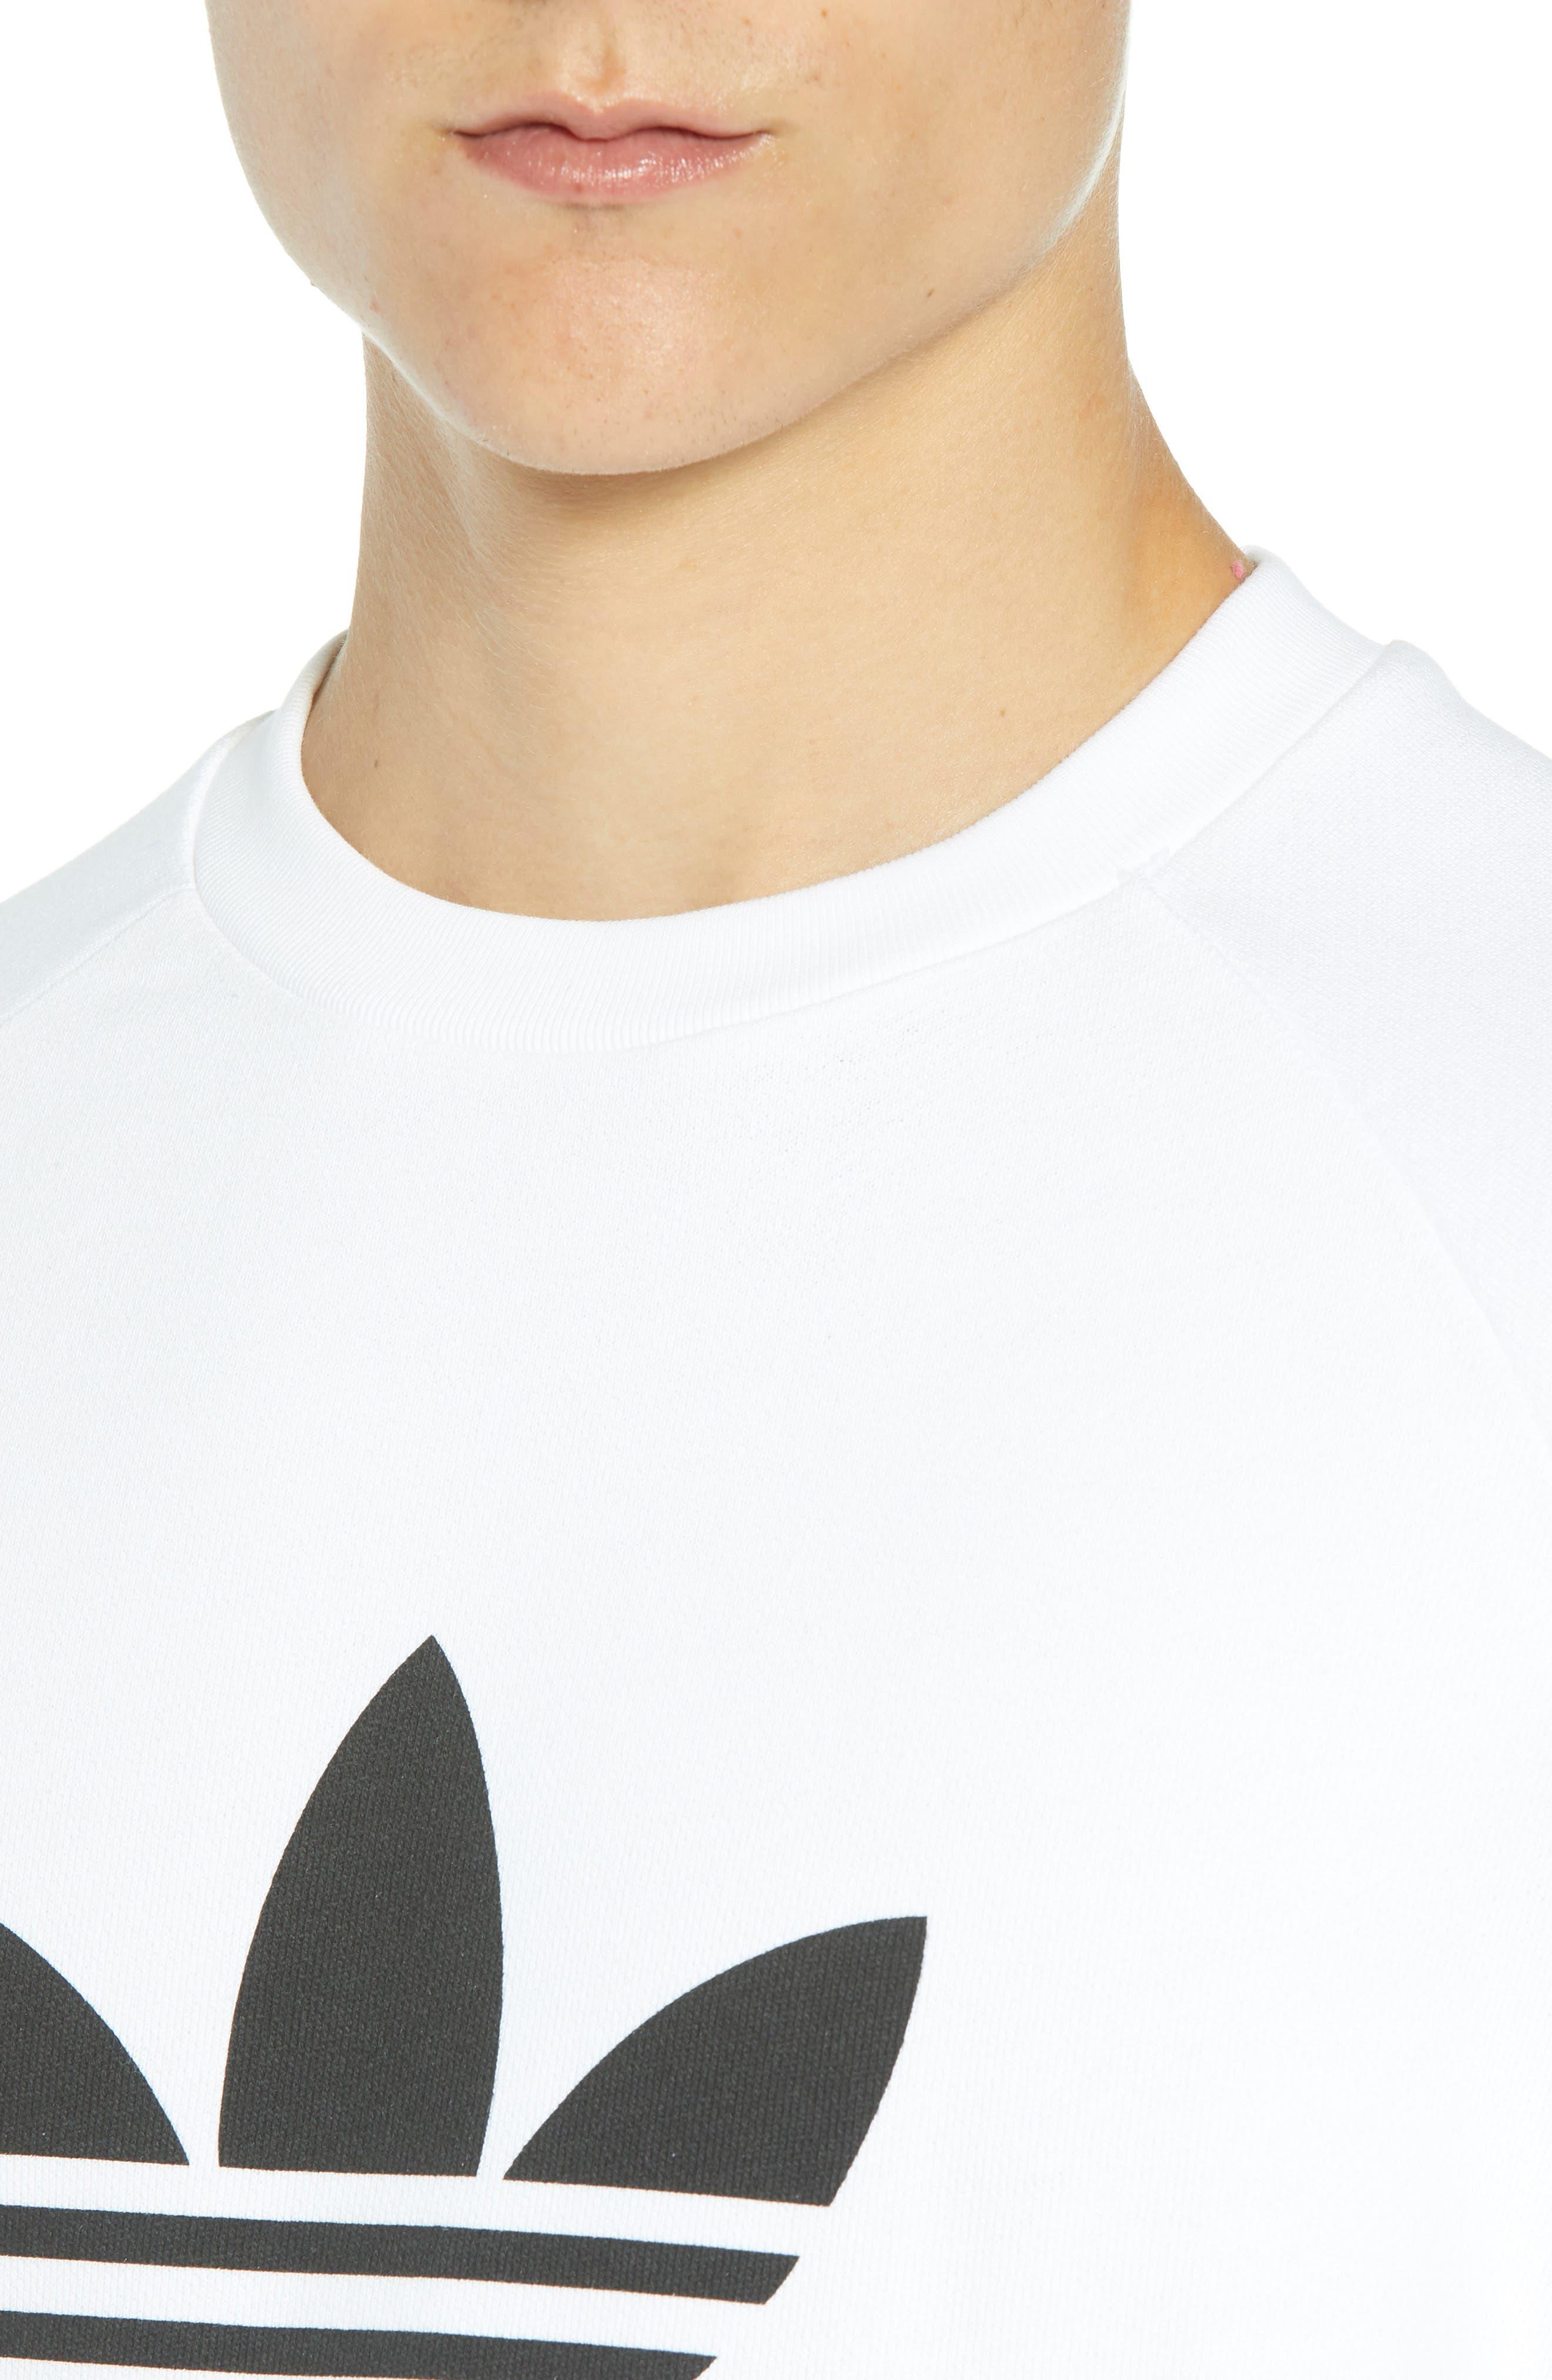 ADIDAS ORIGINALS, Trefoil Sweatshirt, Alternate thumbnail 4, color, WHITE